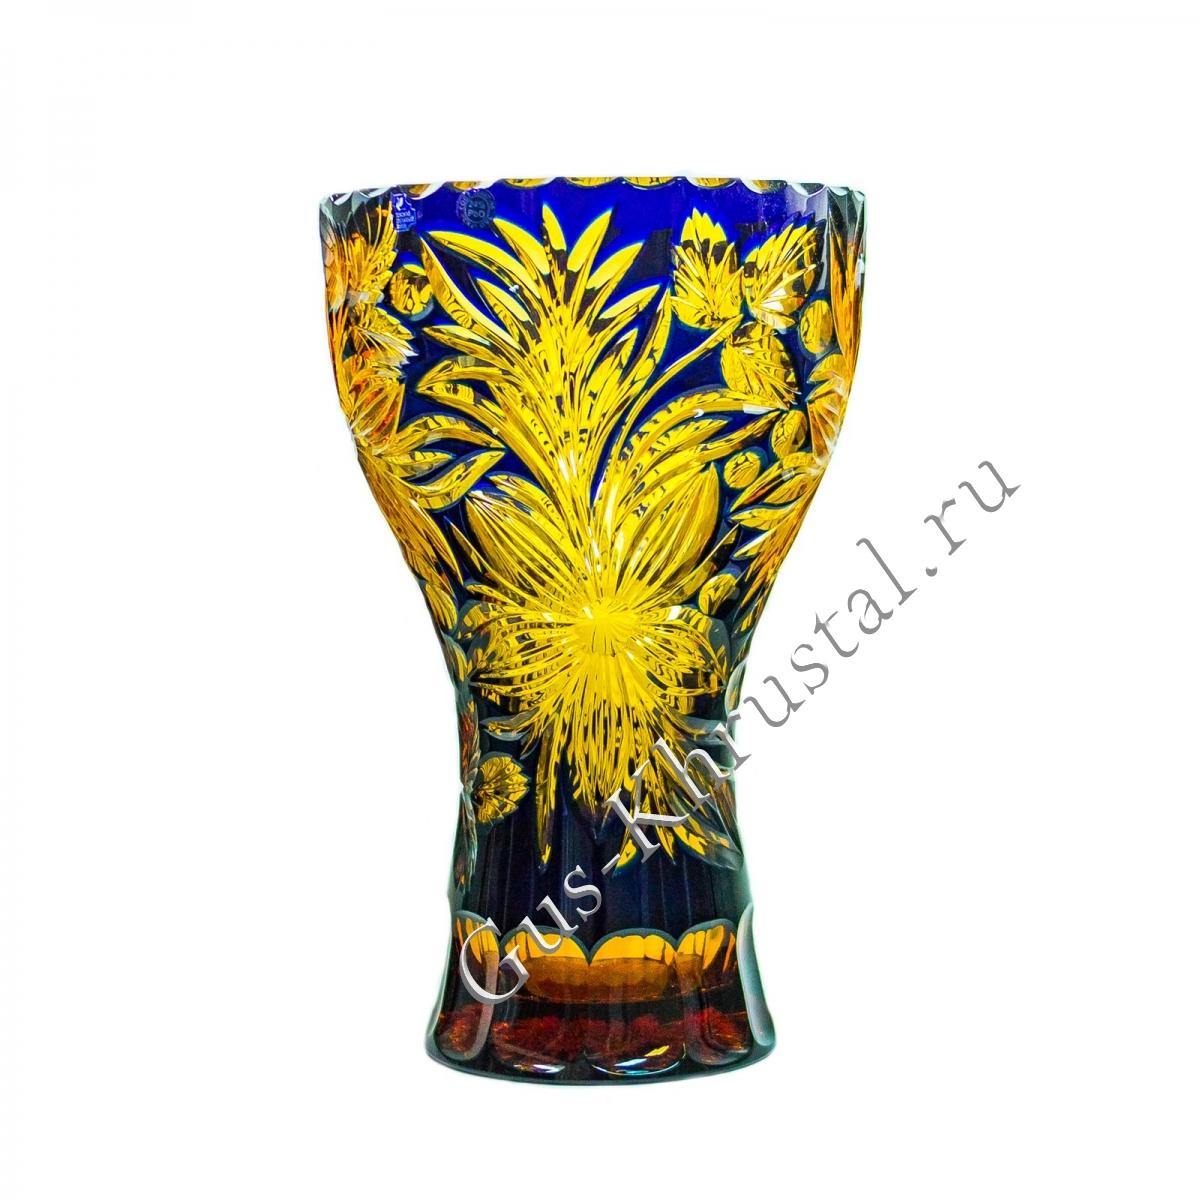 Ваза Хрустальная Для Цветов Звездная Карусель чайно-кобальтовая